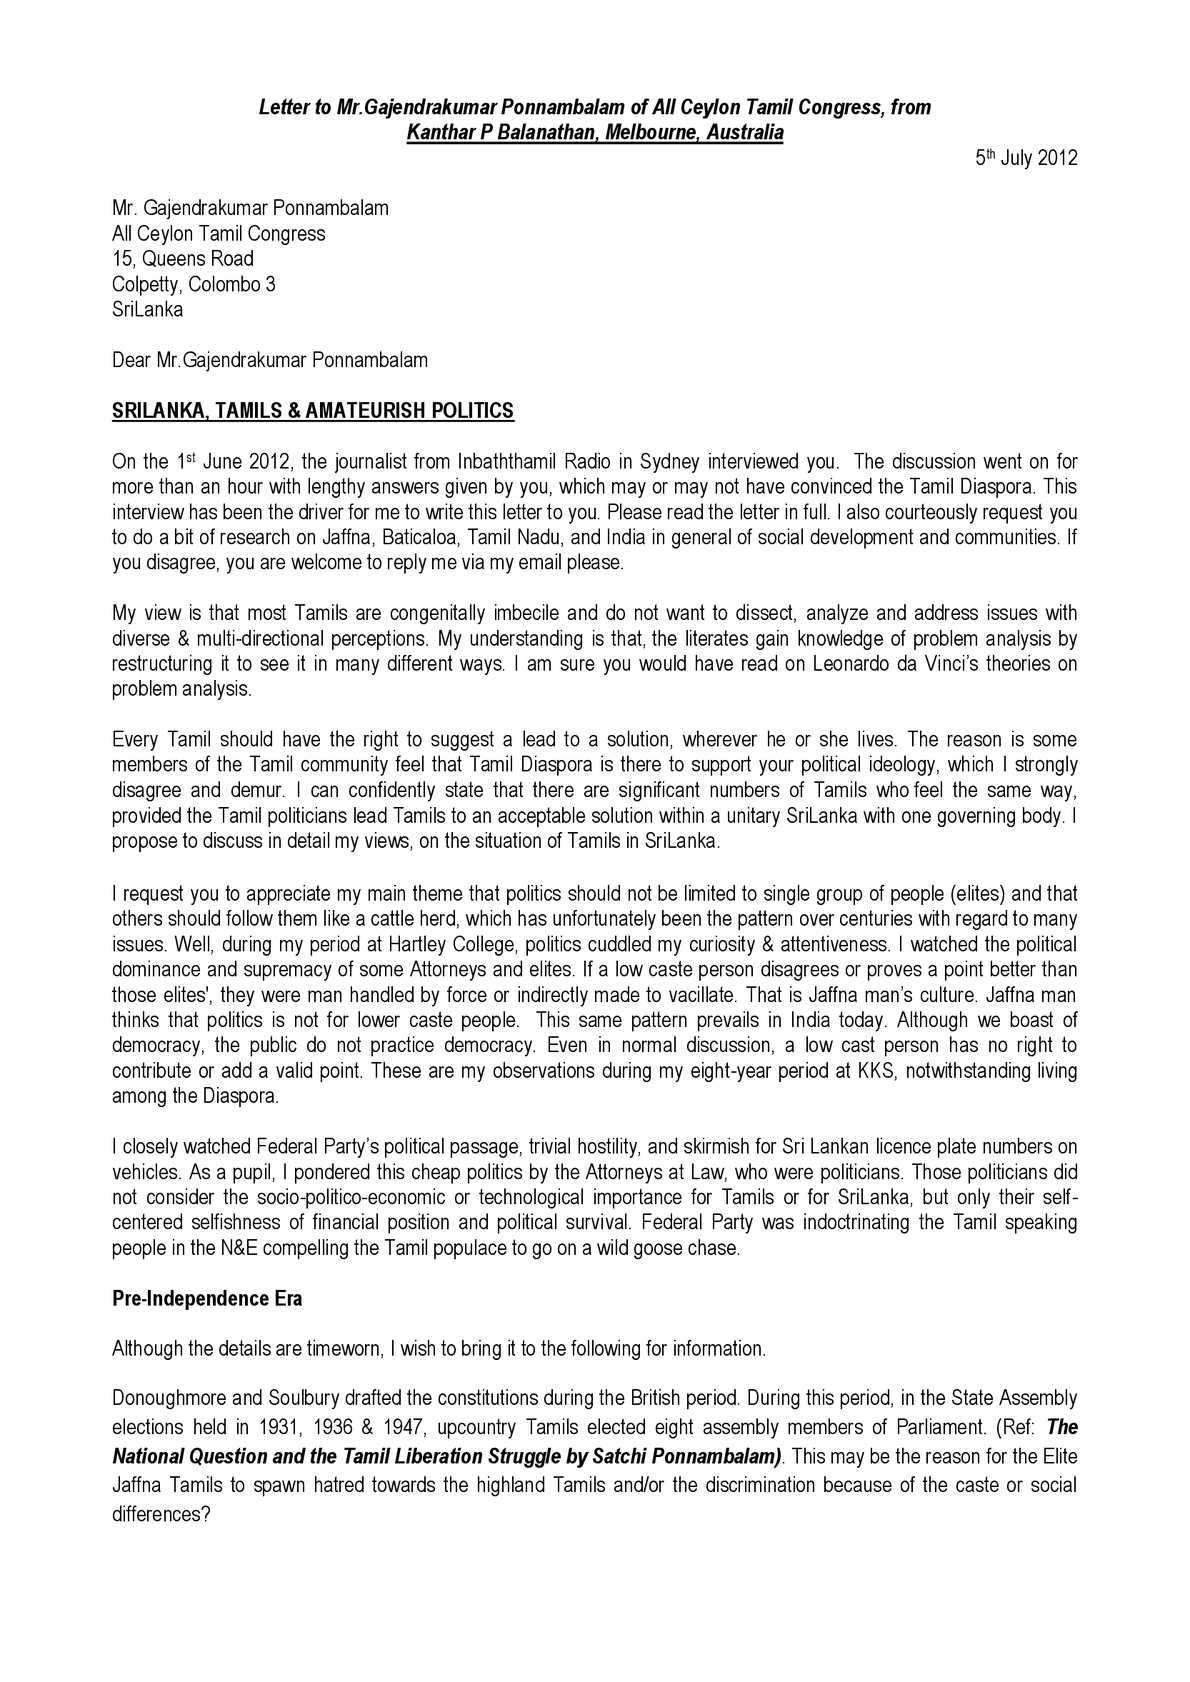 calameo letter to mr gajendrakumar ponnambalam of all ceylon tamil